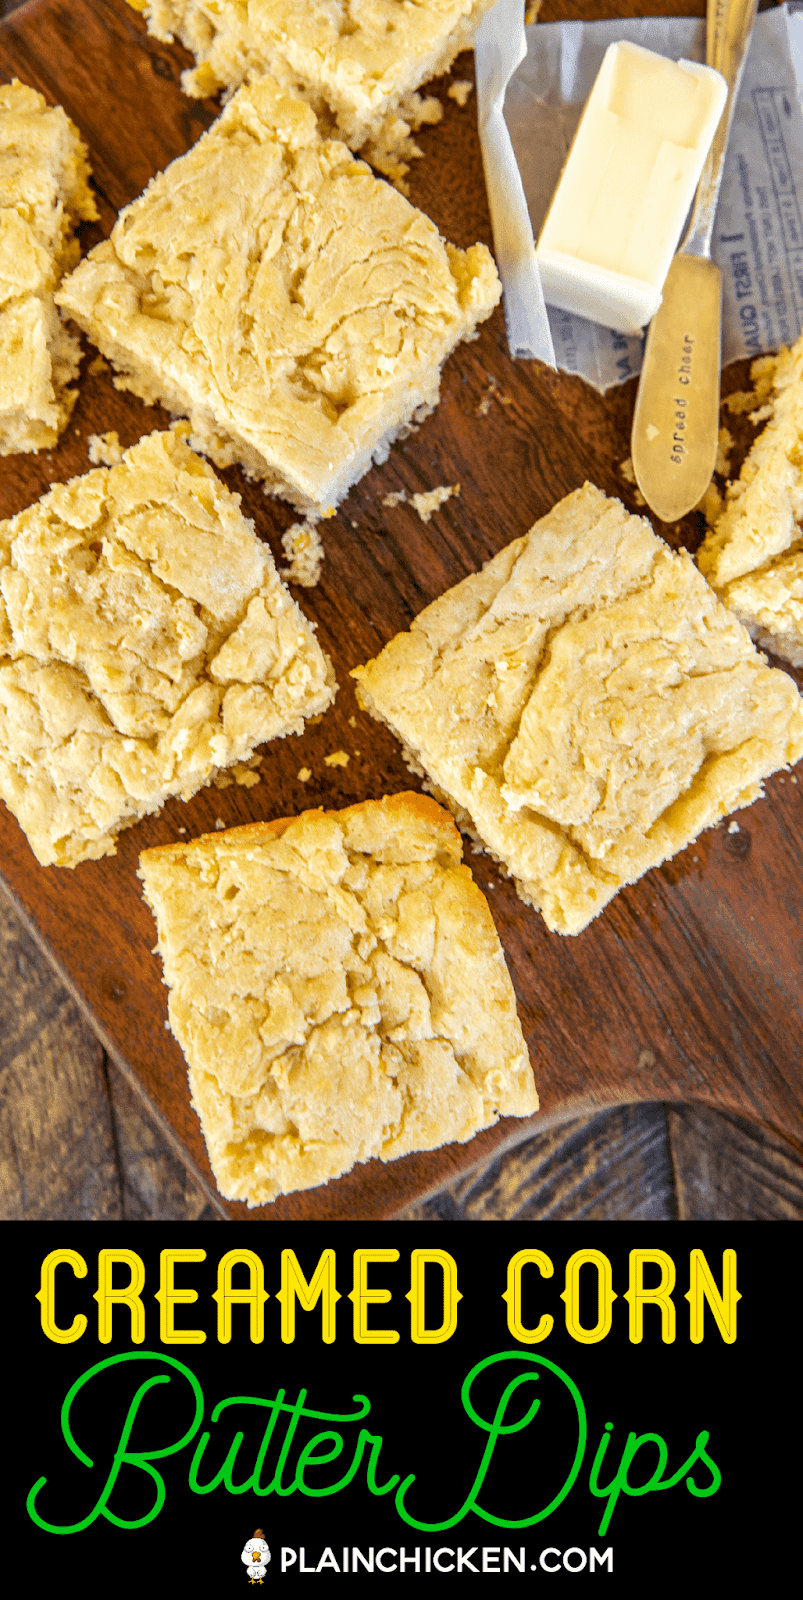 cornbread on a platter